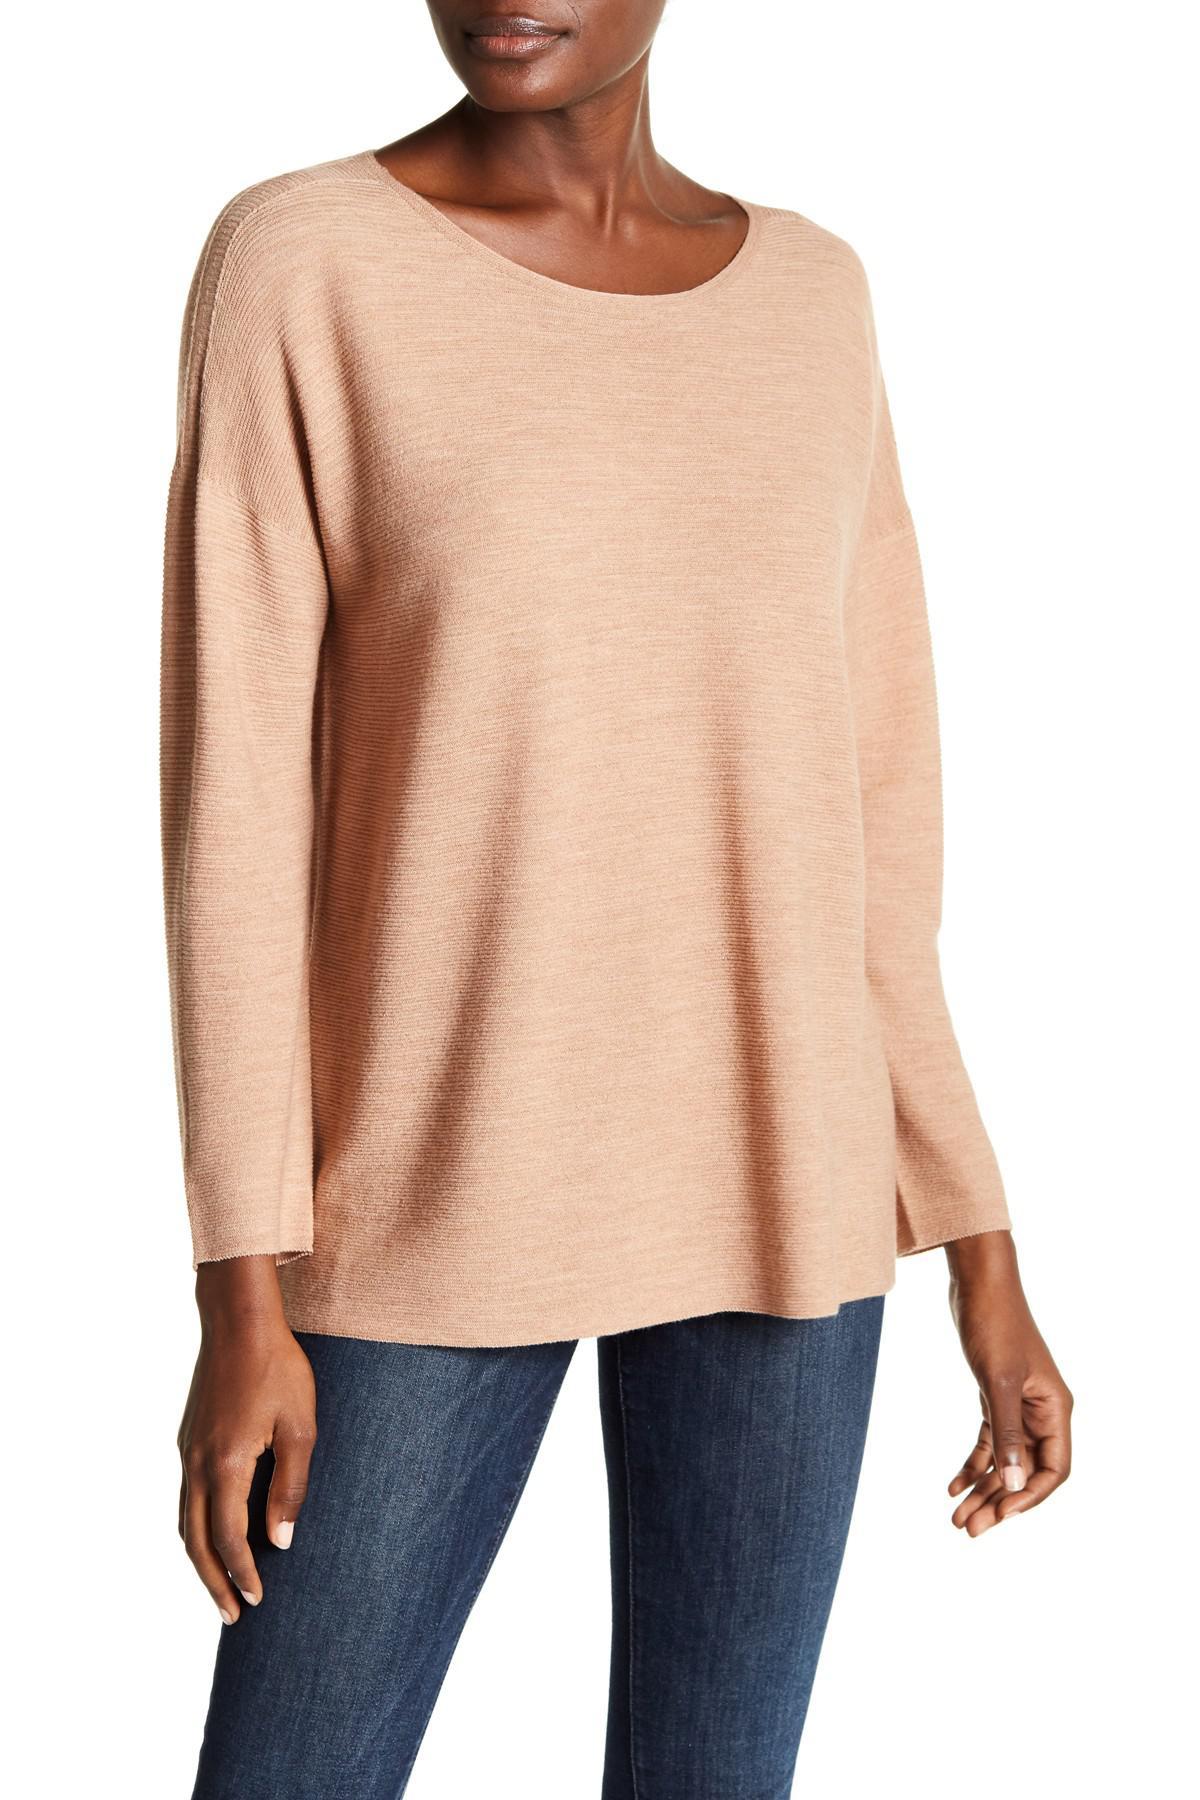 Wool Sweater Grey: Eileen Fisher Boxy Draped Wool Sweater